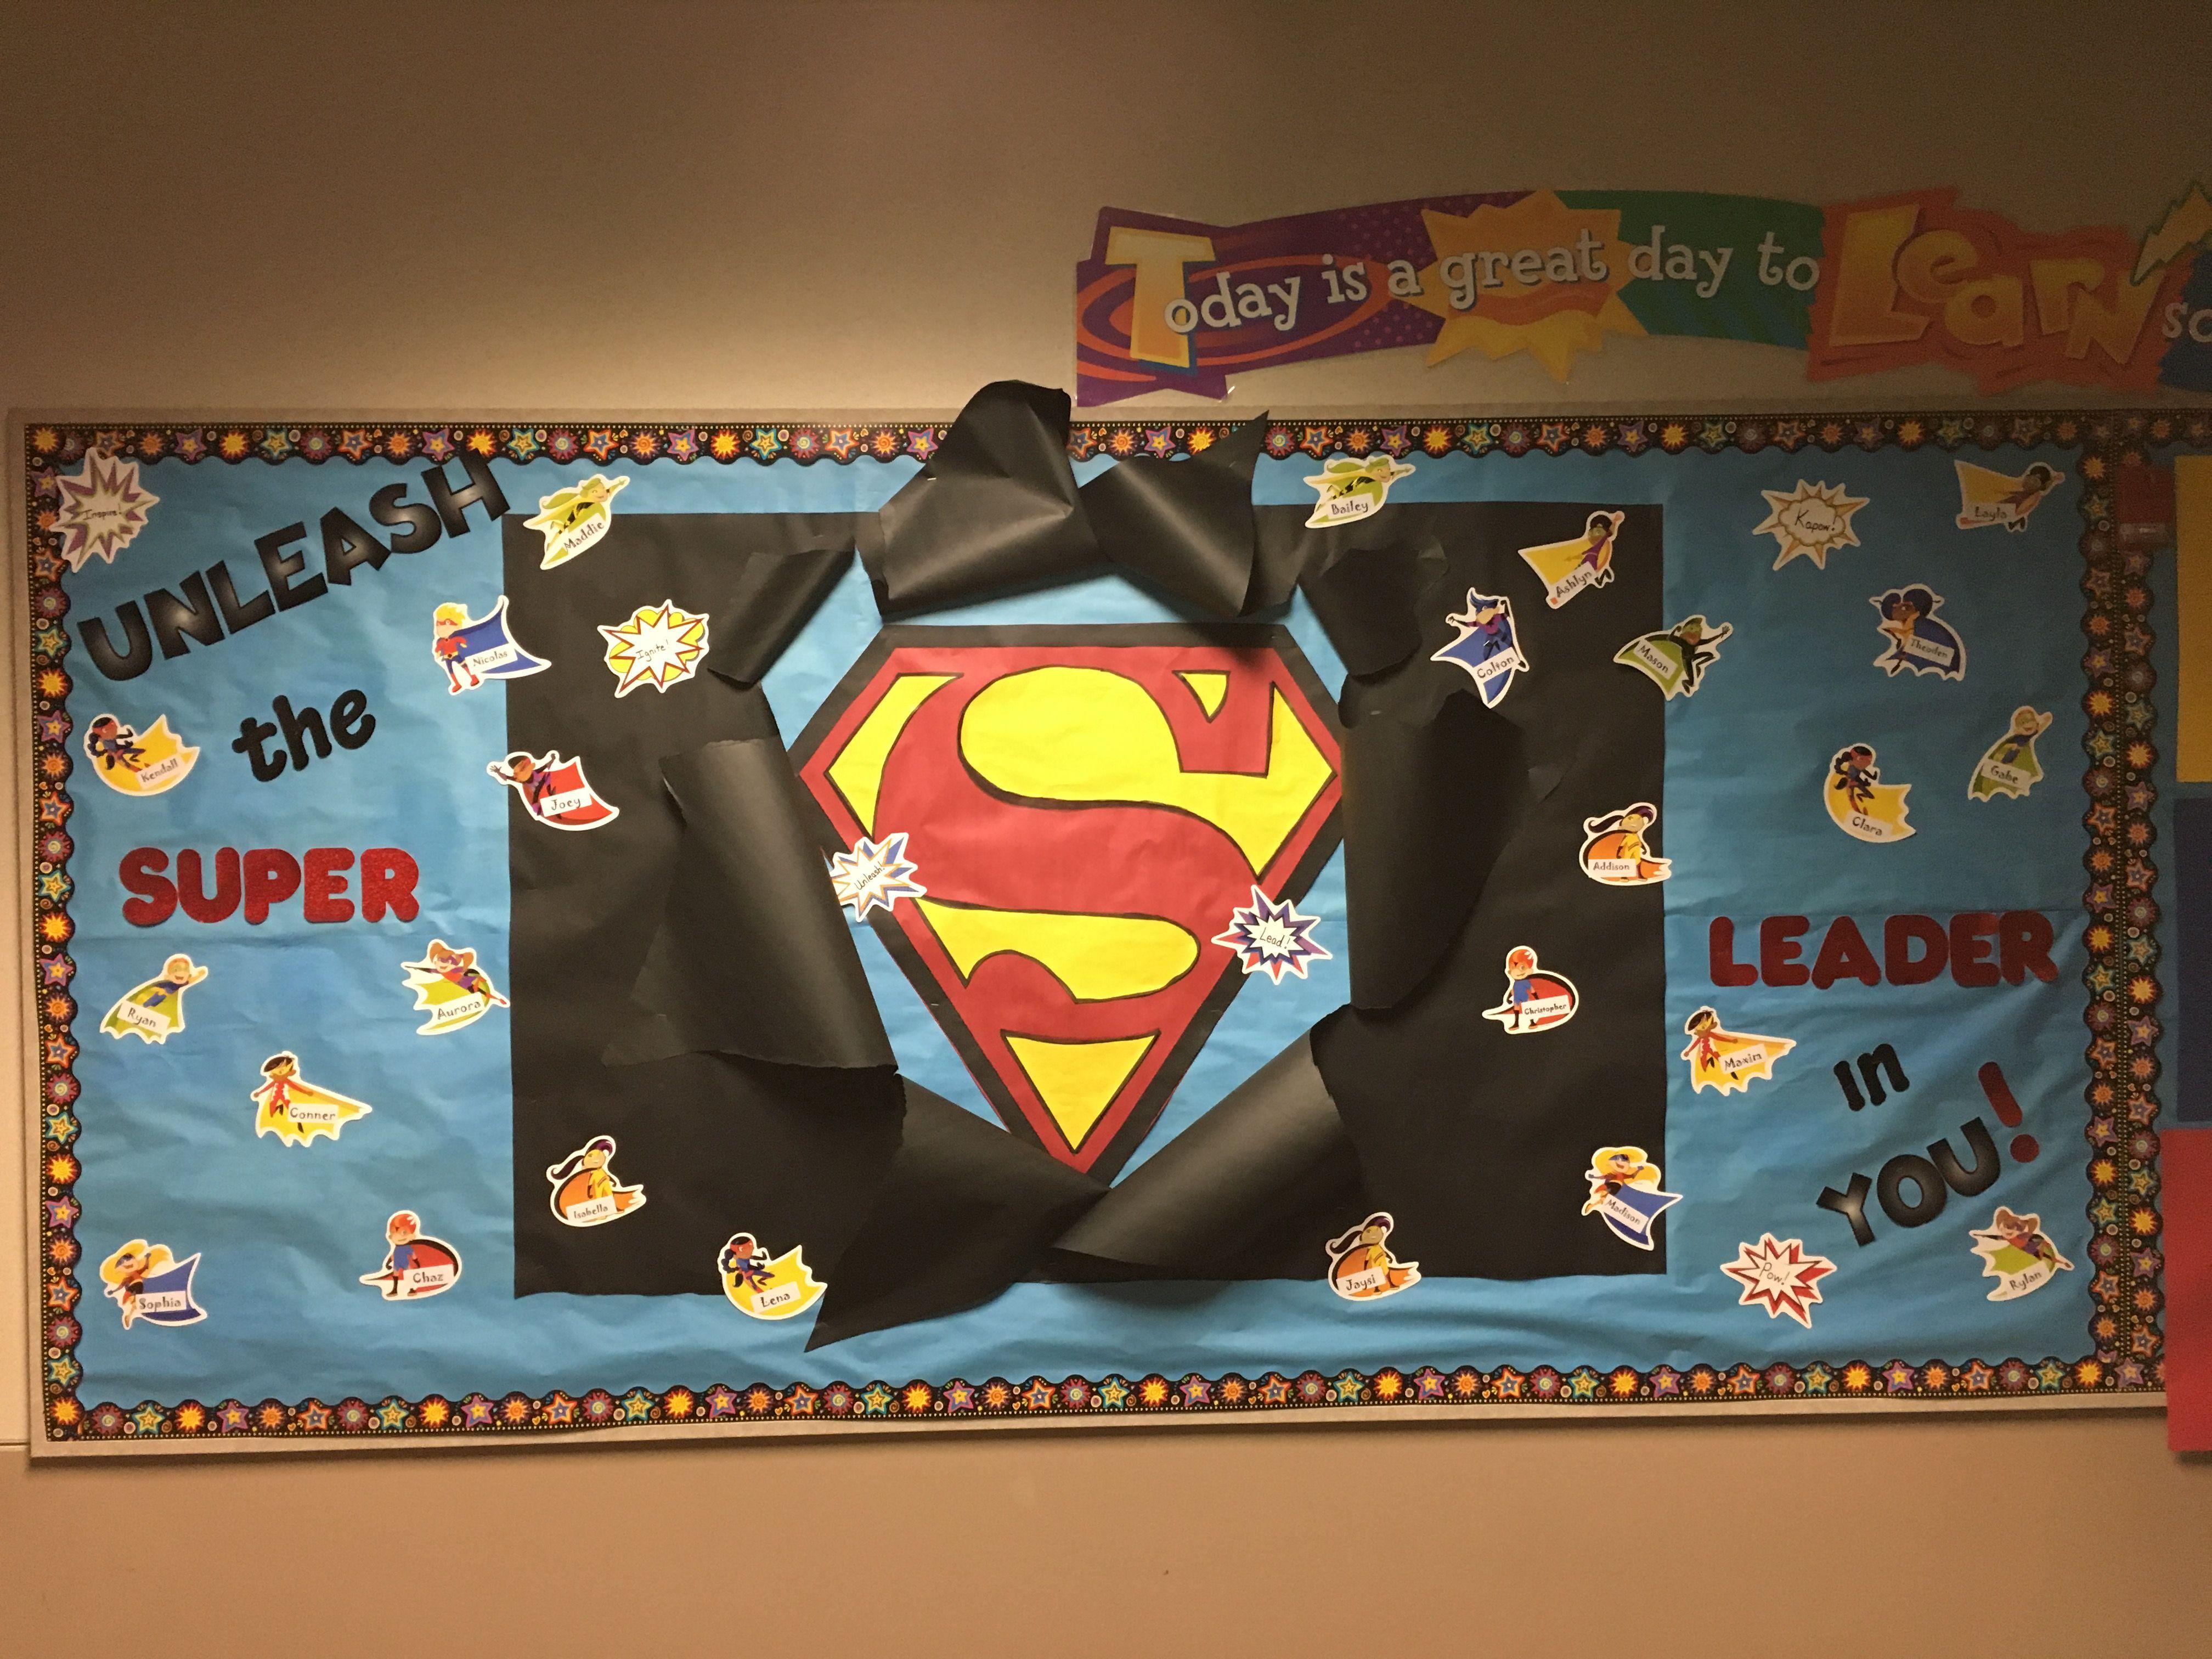 Exceptional Superhero Bulletin Board / Leader In Me